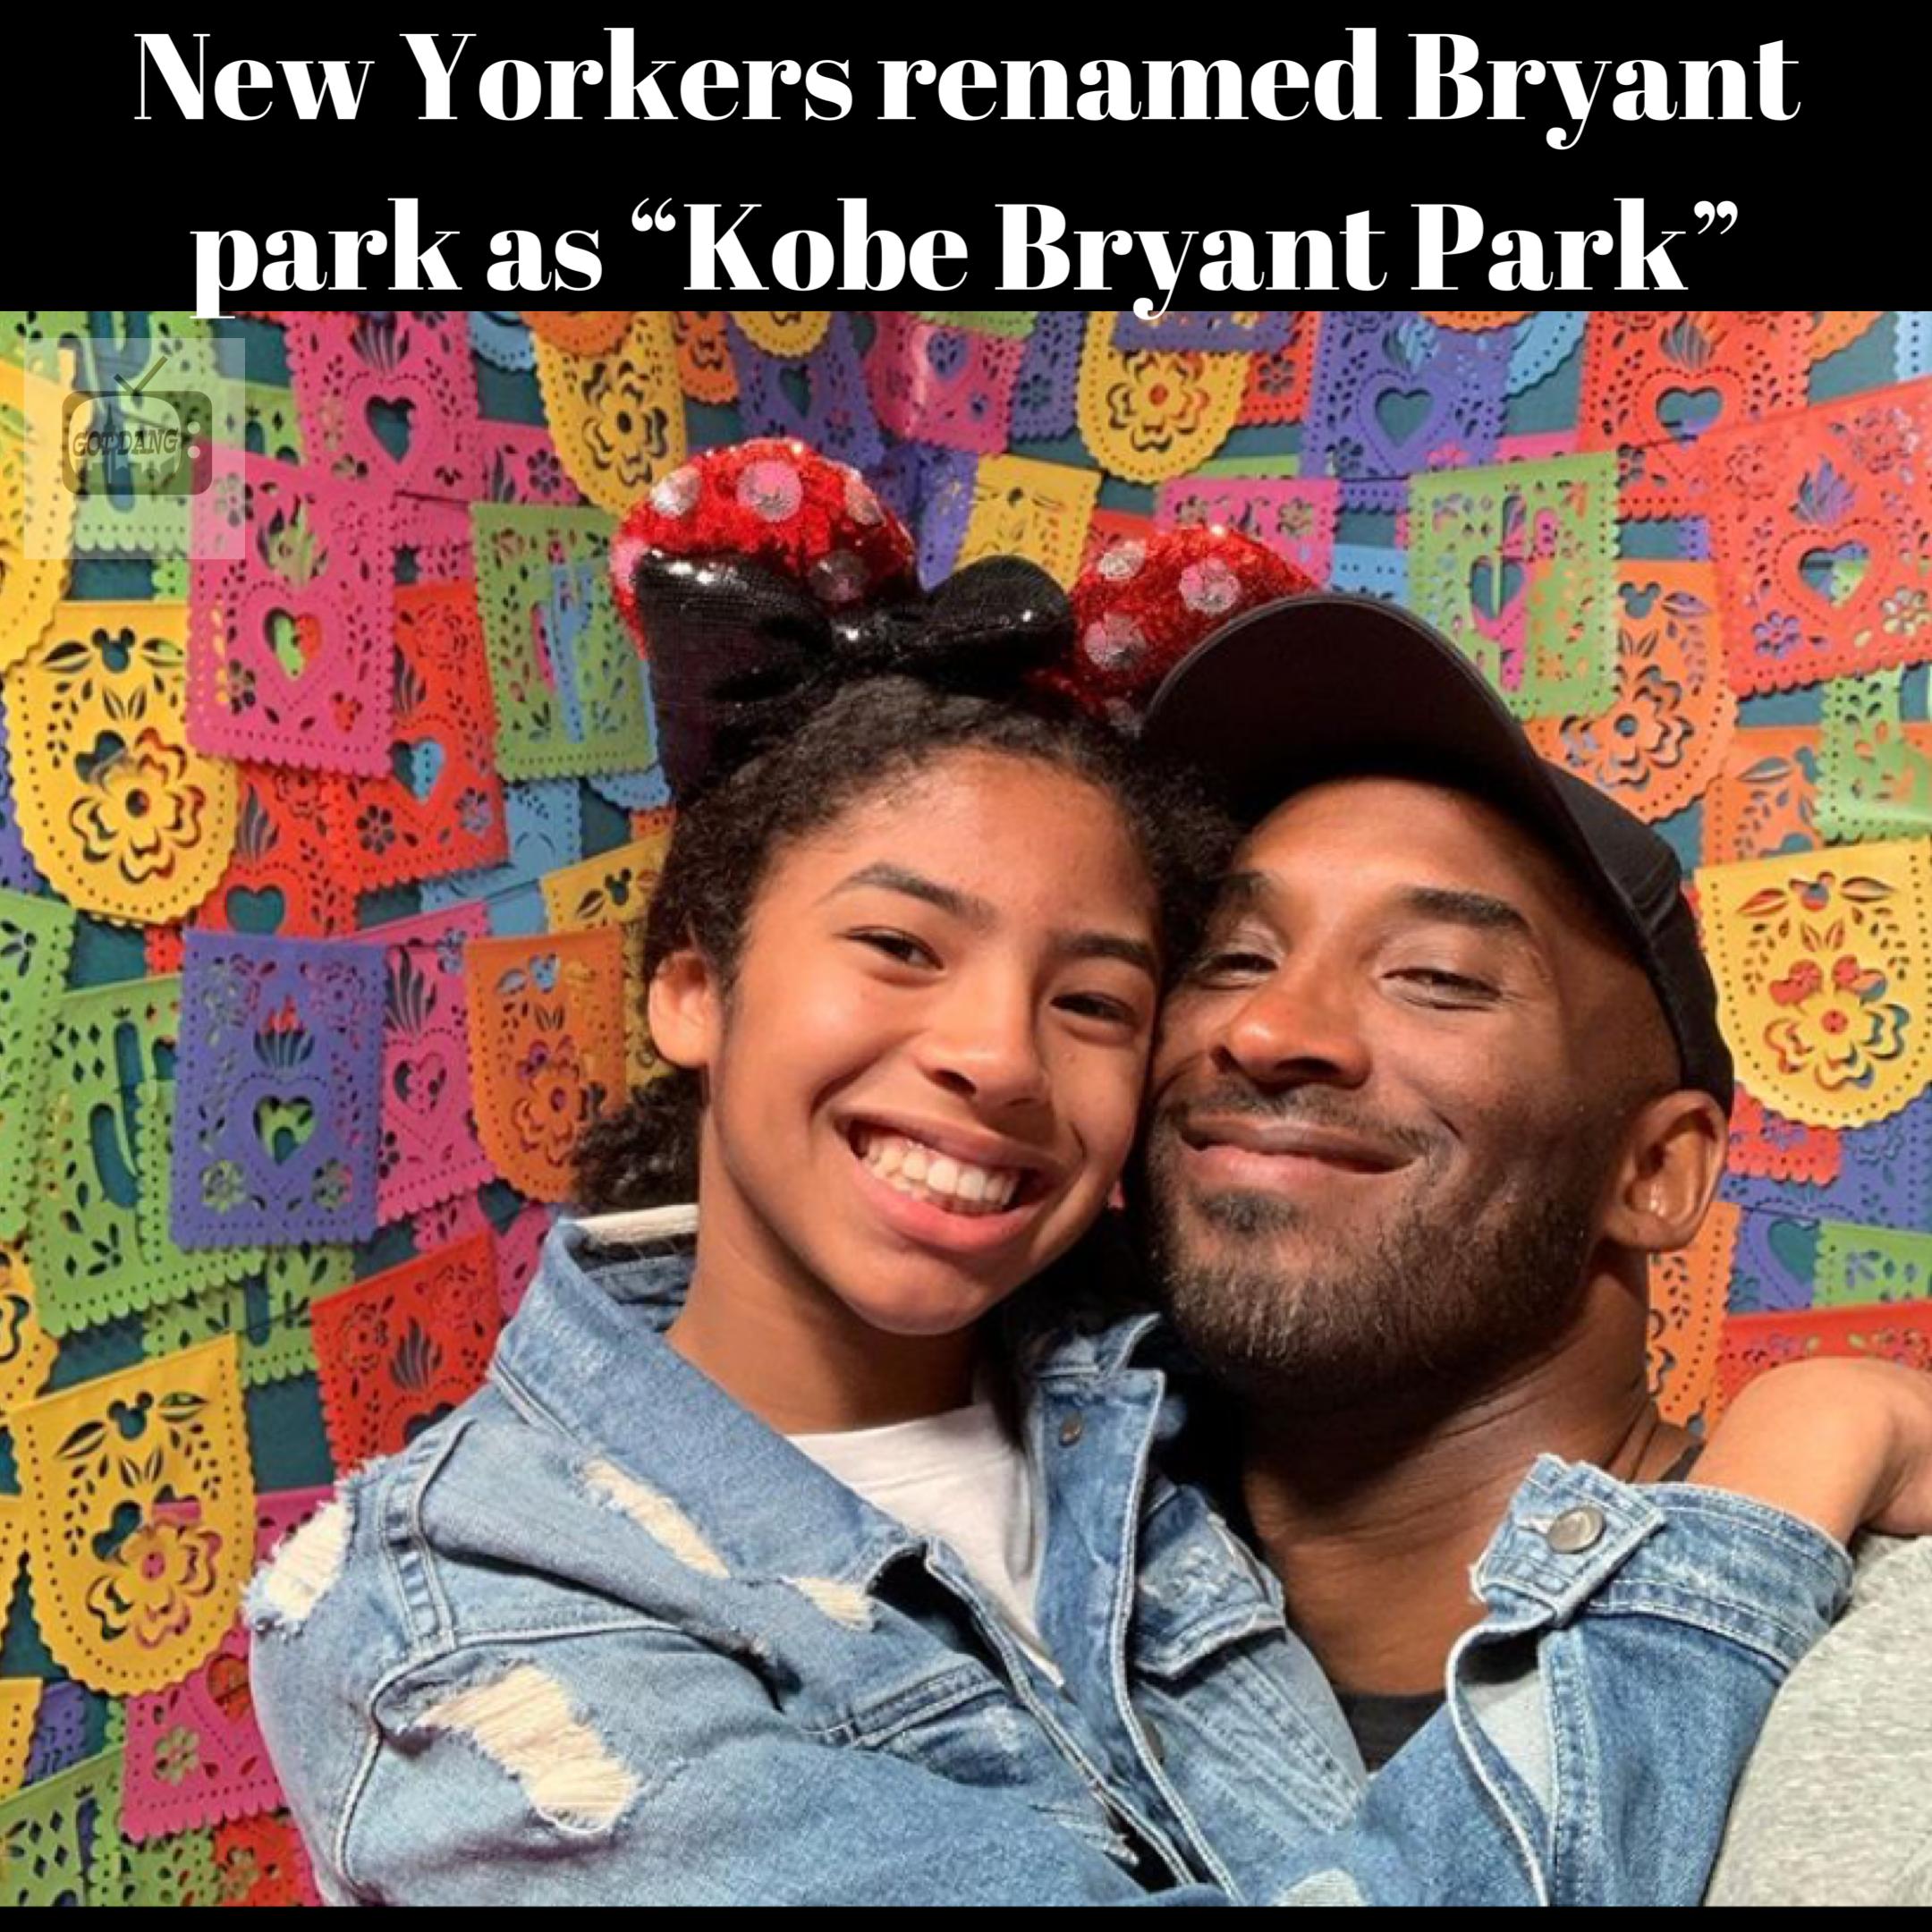 "New Yorkers renamed Bryant park as ""Kobe Bryant Park"""